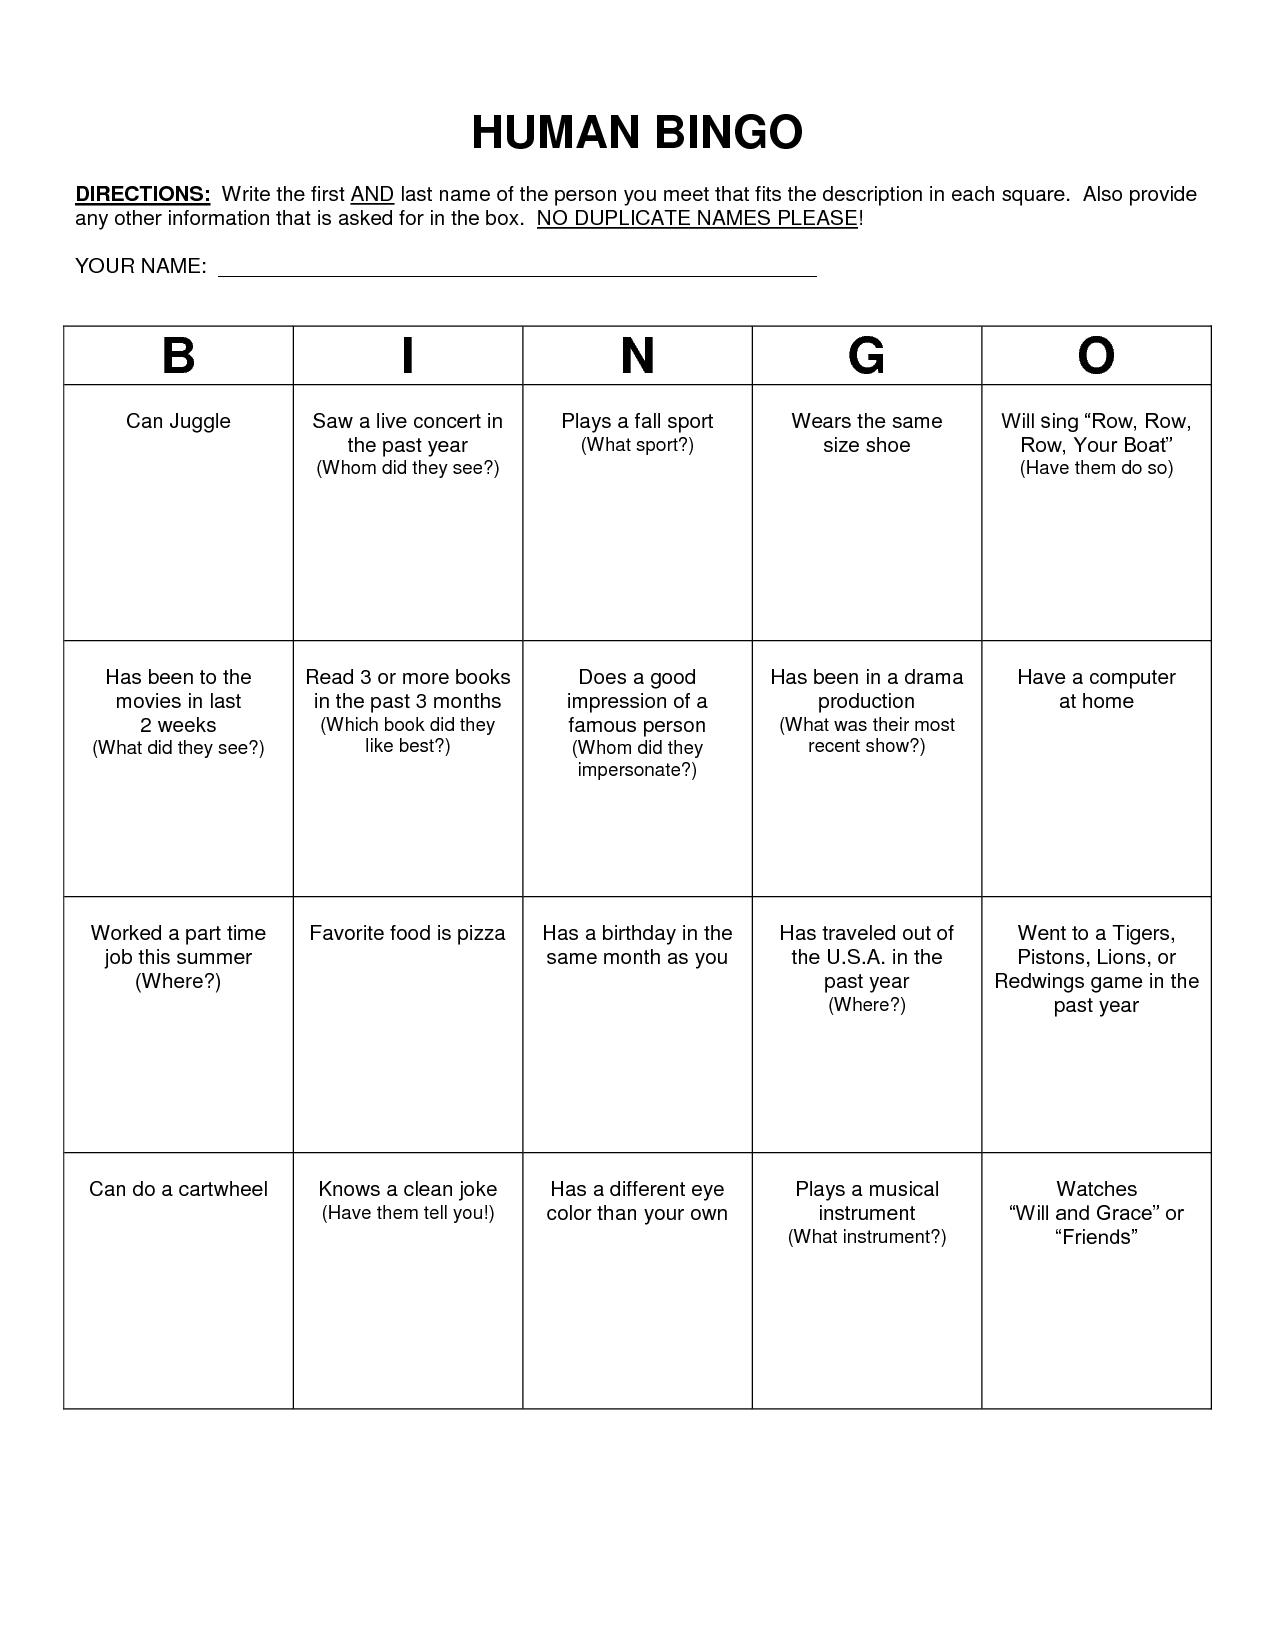 Human Bingo Scavenger Hunt Template | Human Bingo, Bingo inside Ice Breaker Bingo Card Template